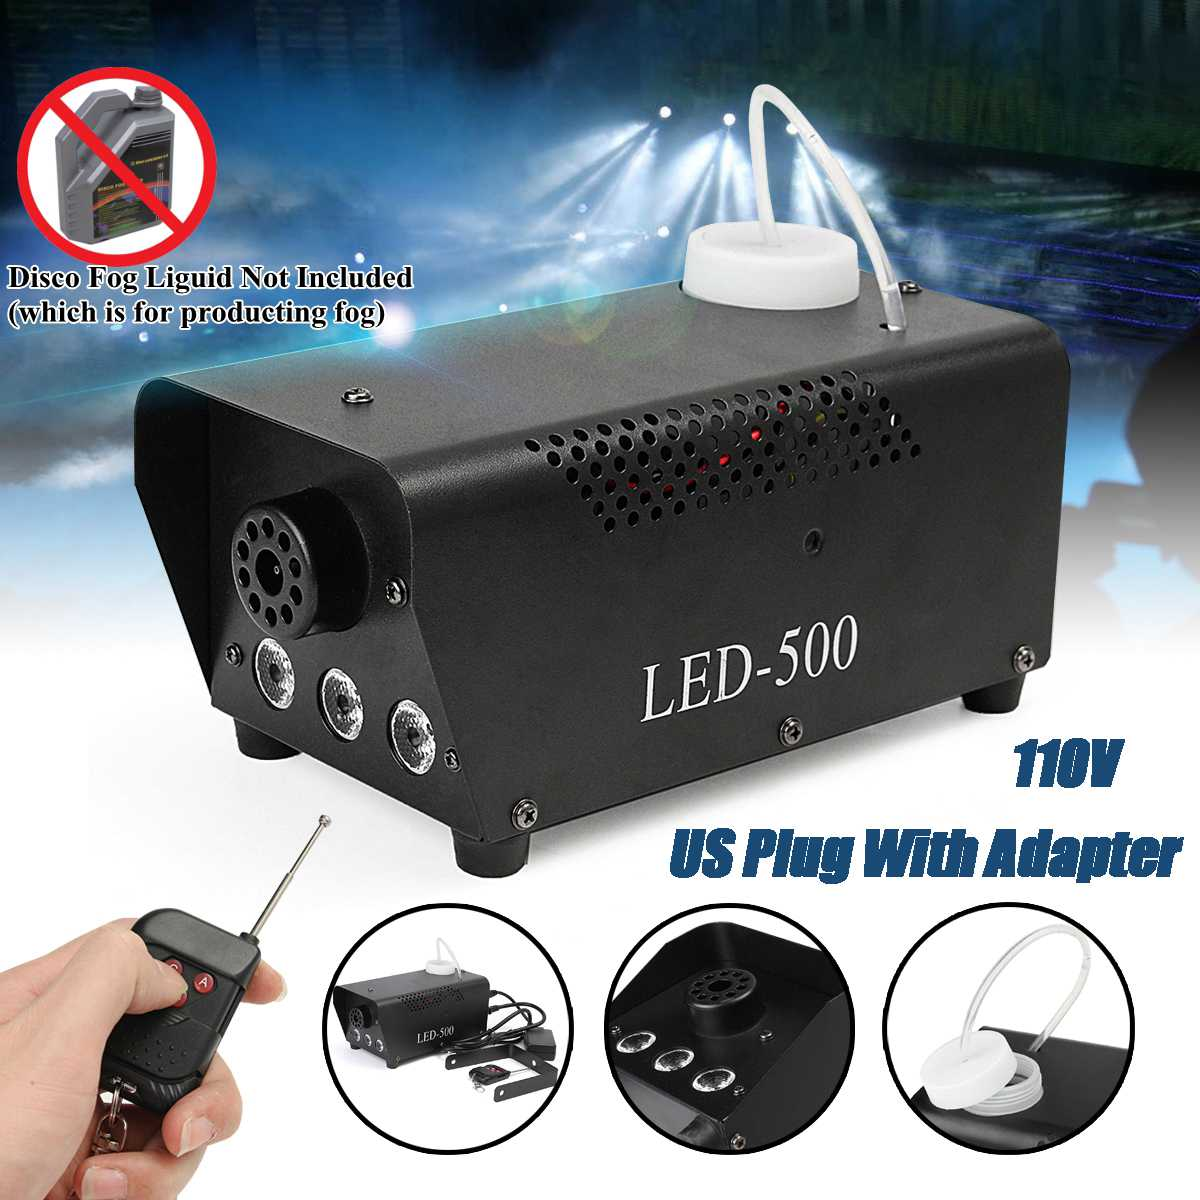 500W אלחוטי עשן ערפל מכונת RGB LED מרחוק DJ דיסקו המפלגה מועדון אור לבן עשן אור